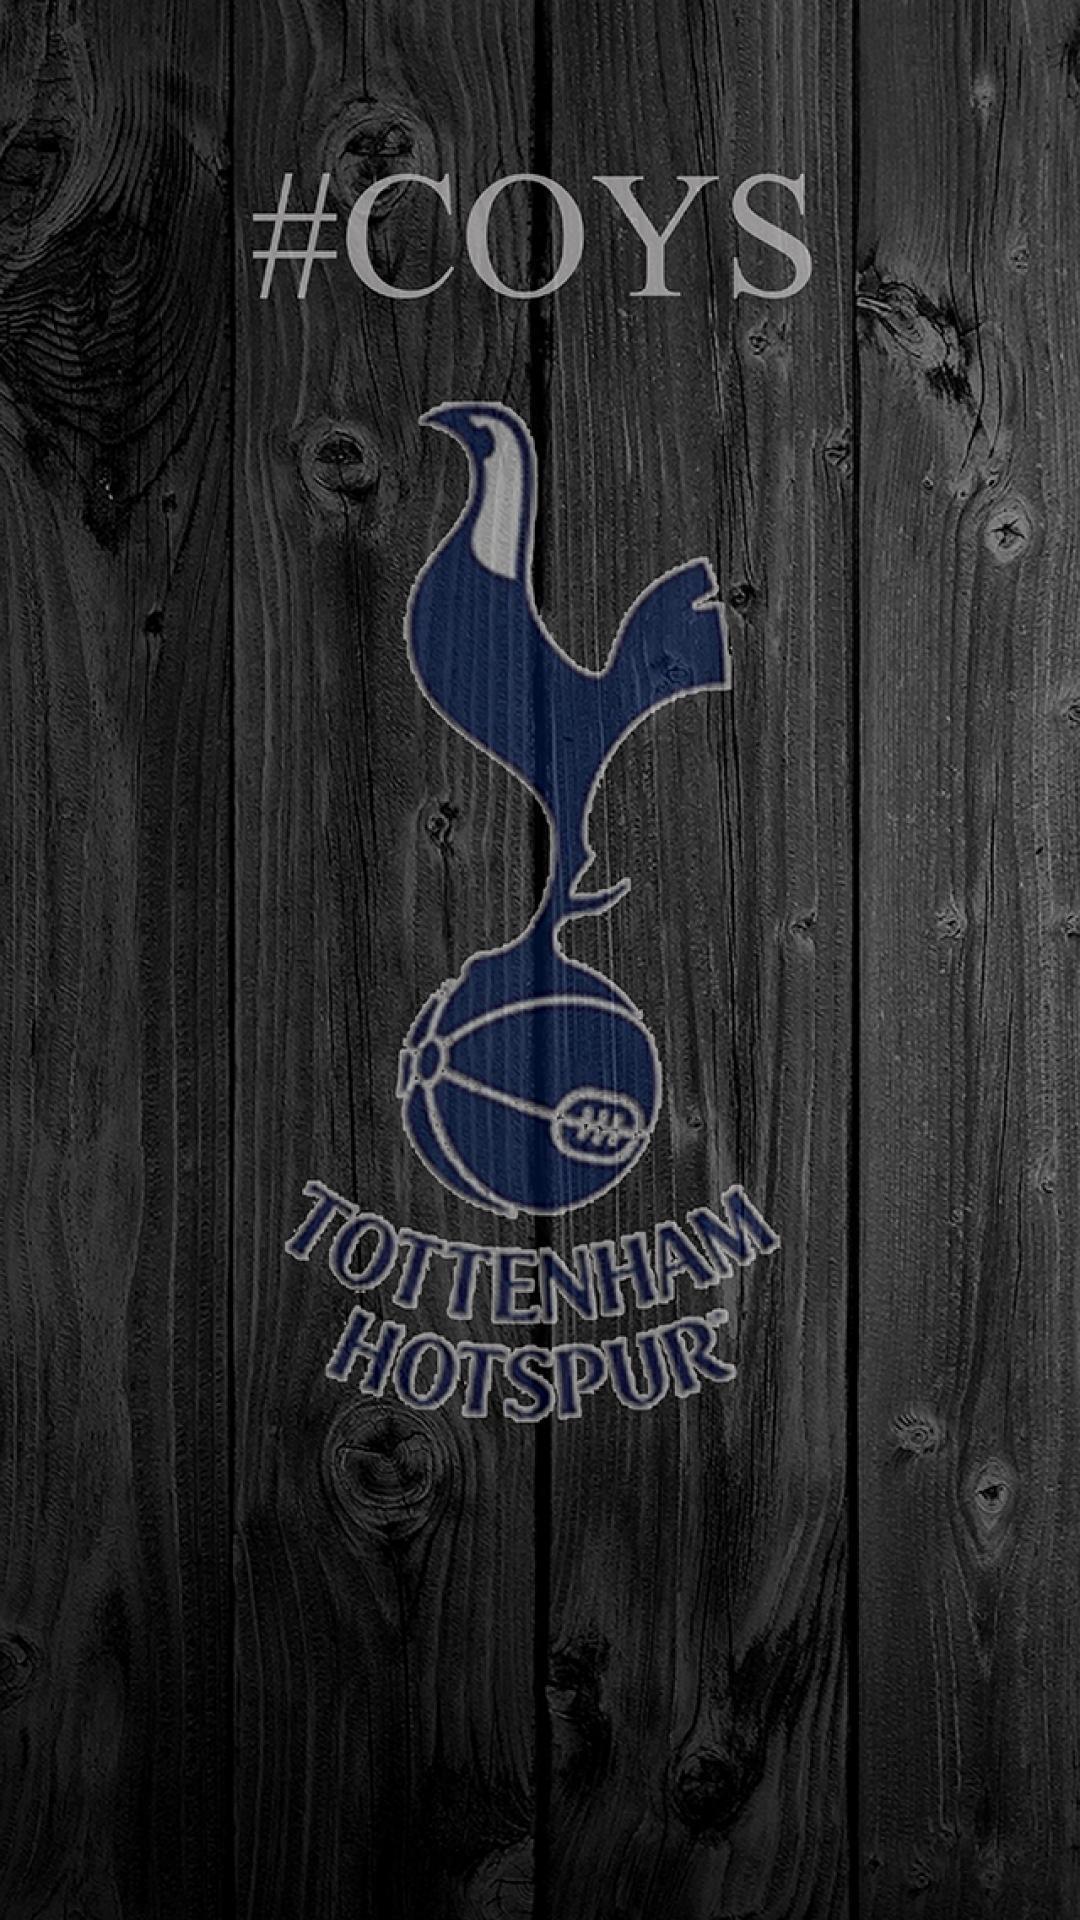 Tottenham Wallpaper Iphone 6 Tottenham Hotspur Wallpapers 183 ① Wallpapertag